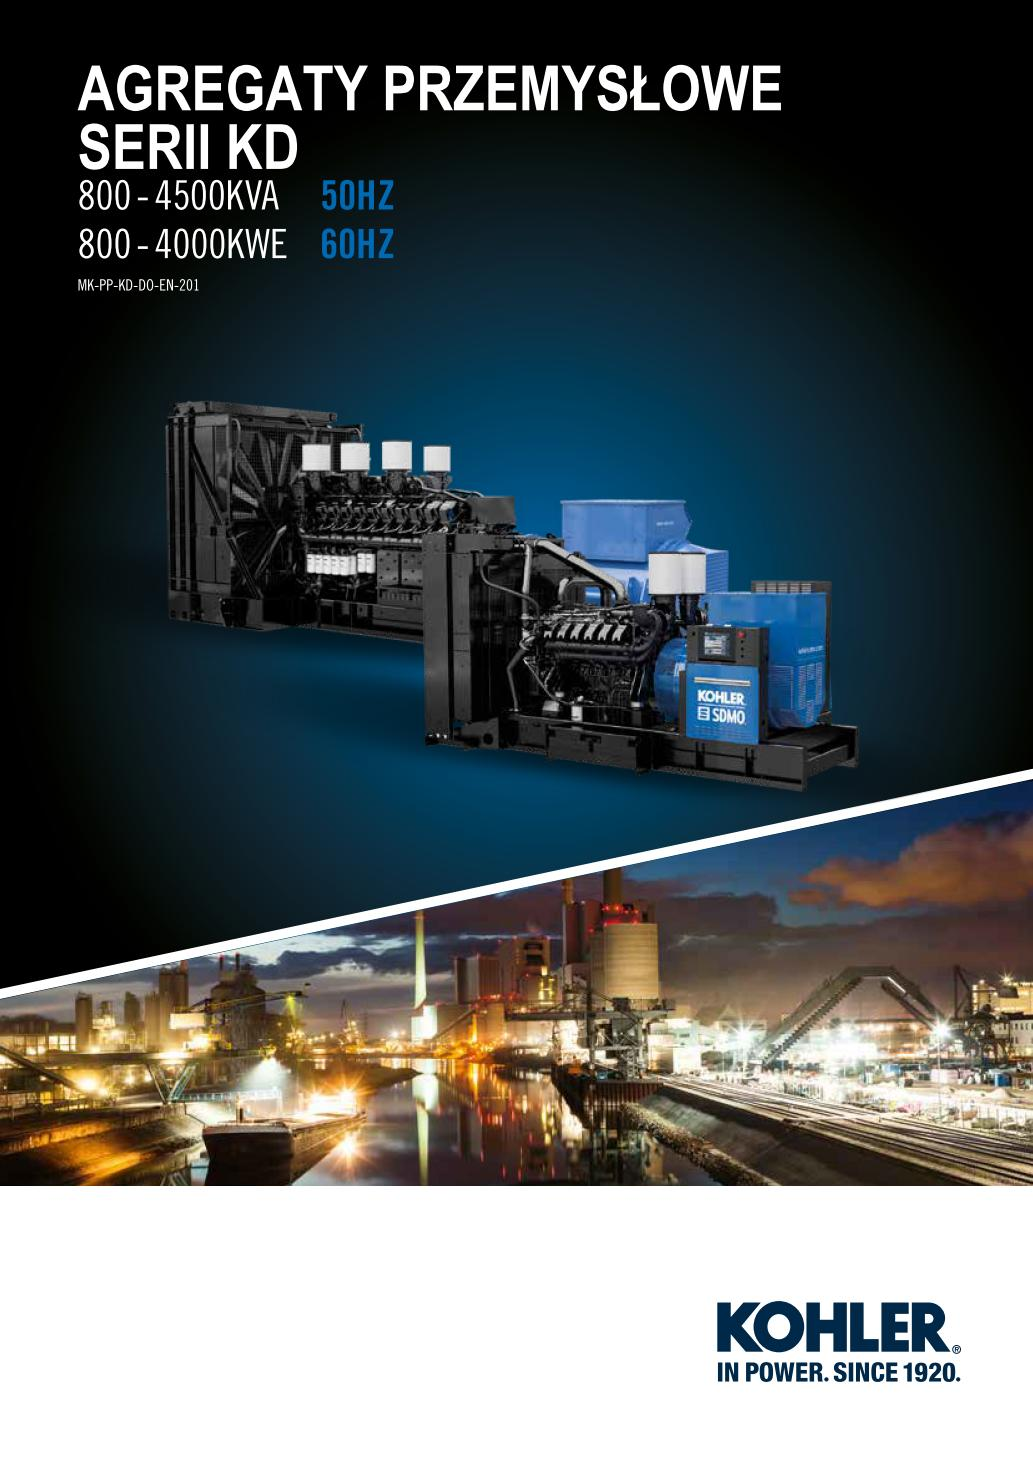 Agregaty serii KD-broszura-20201207